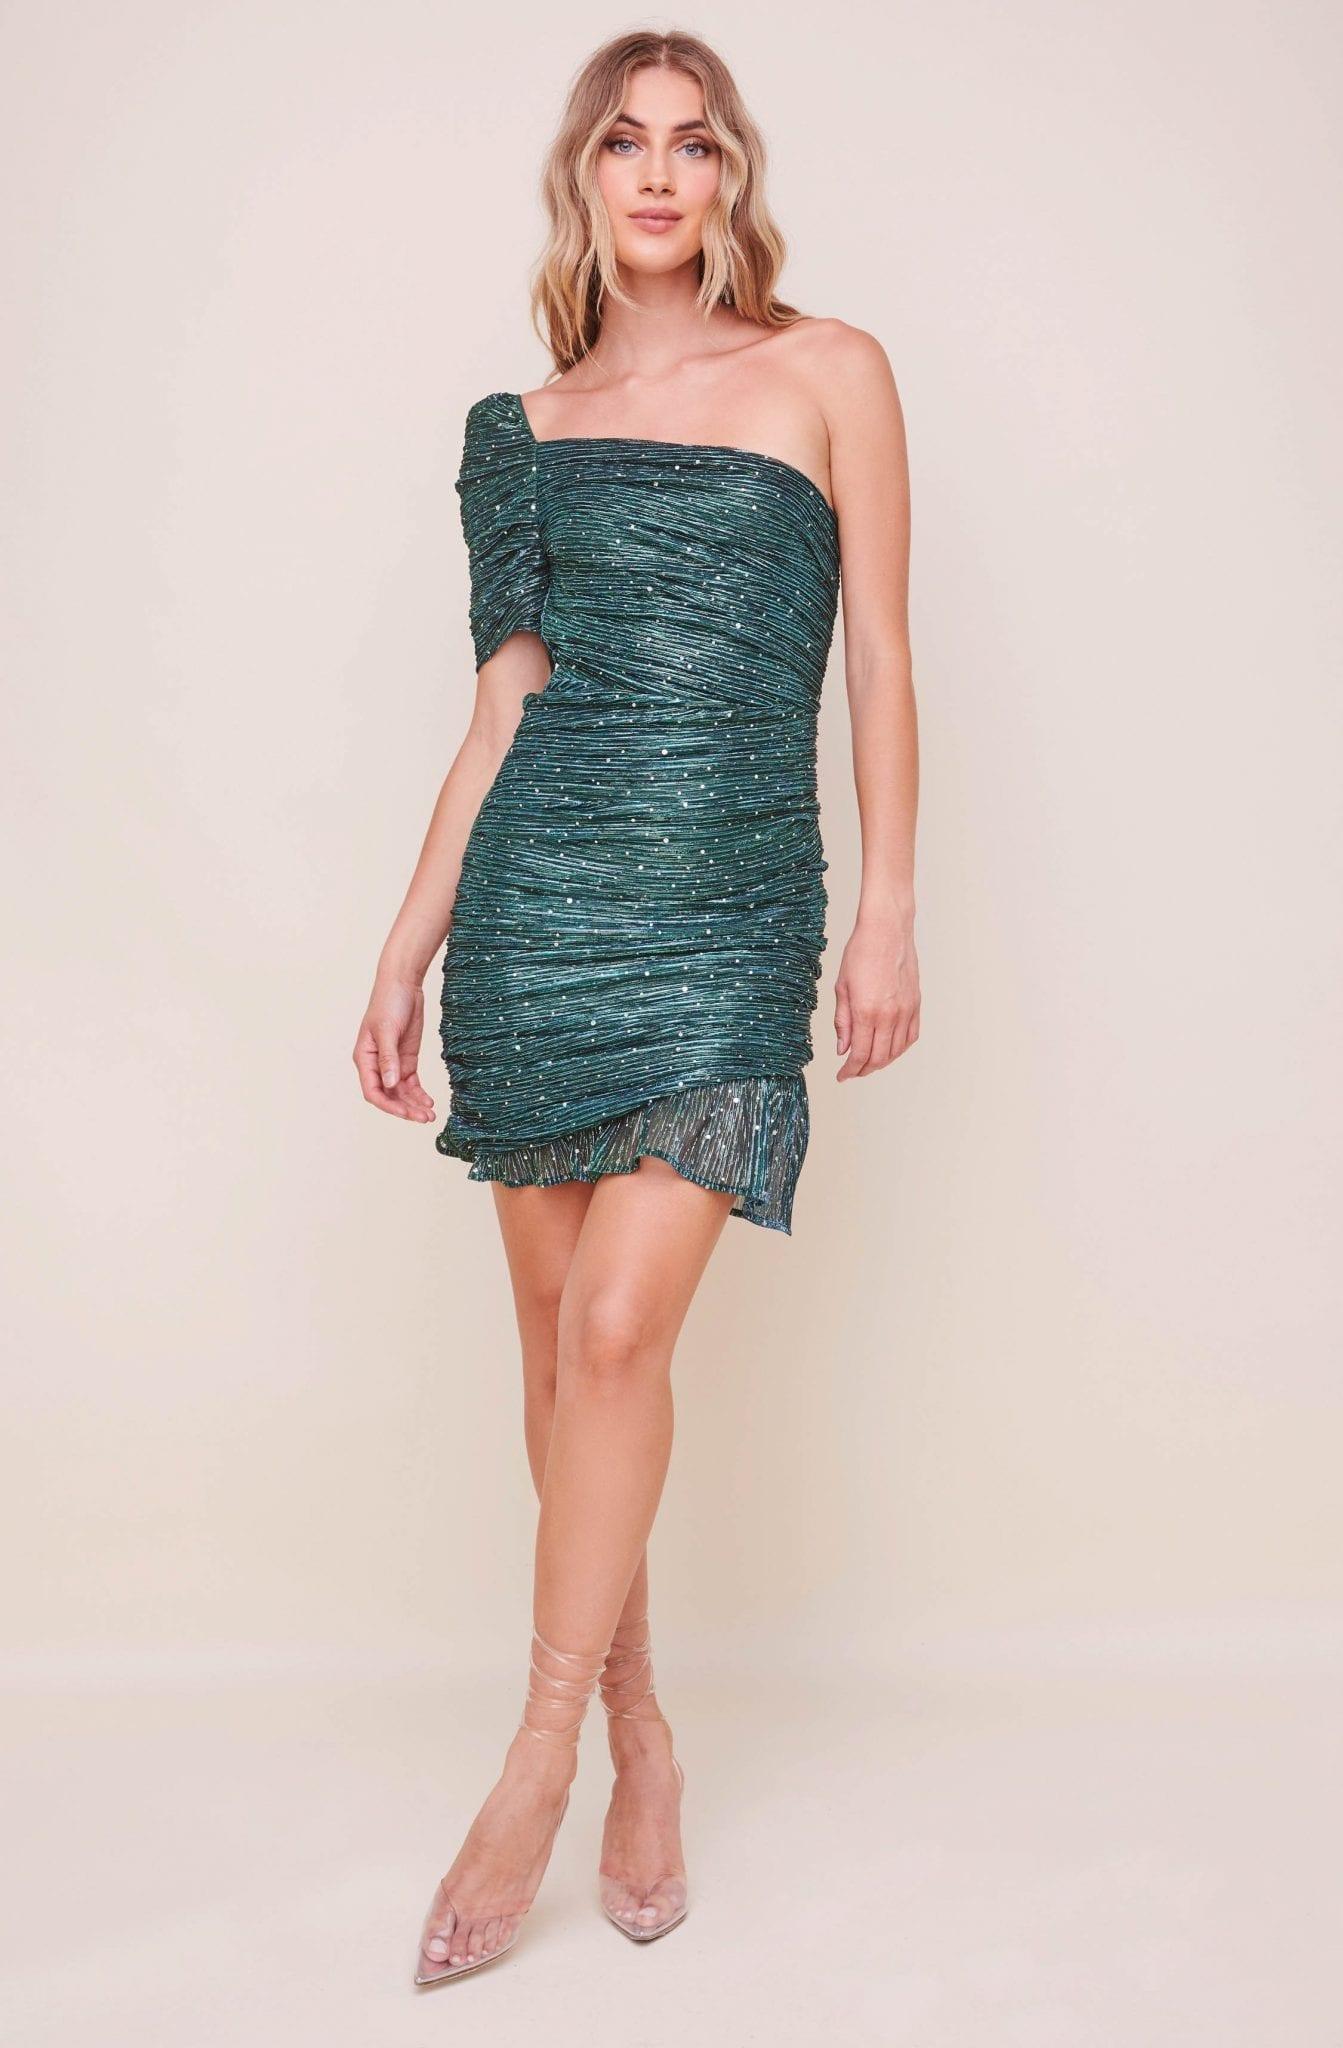 ASTRTHELABEL Ally One Shoulder Mini Dress